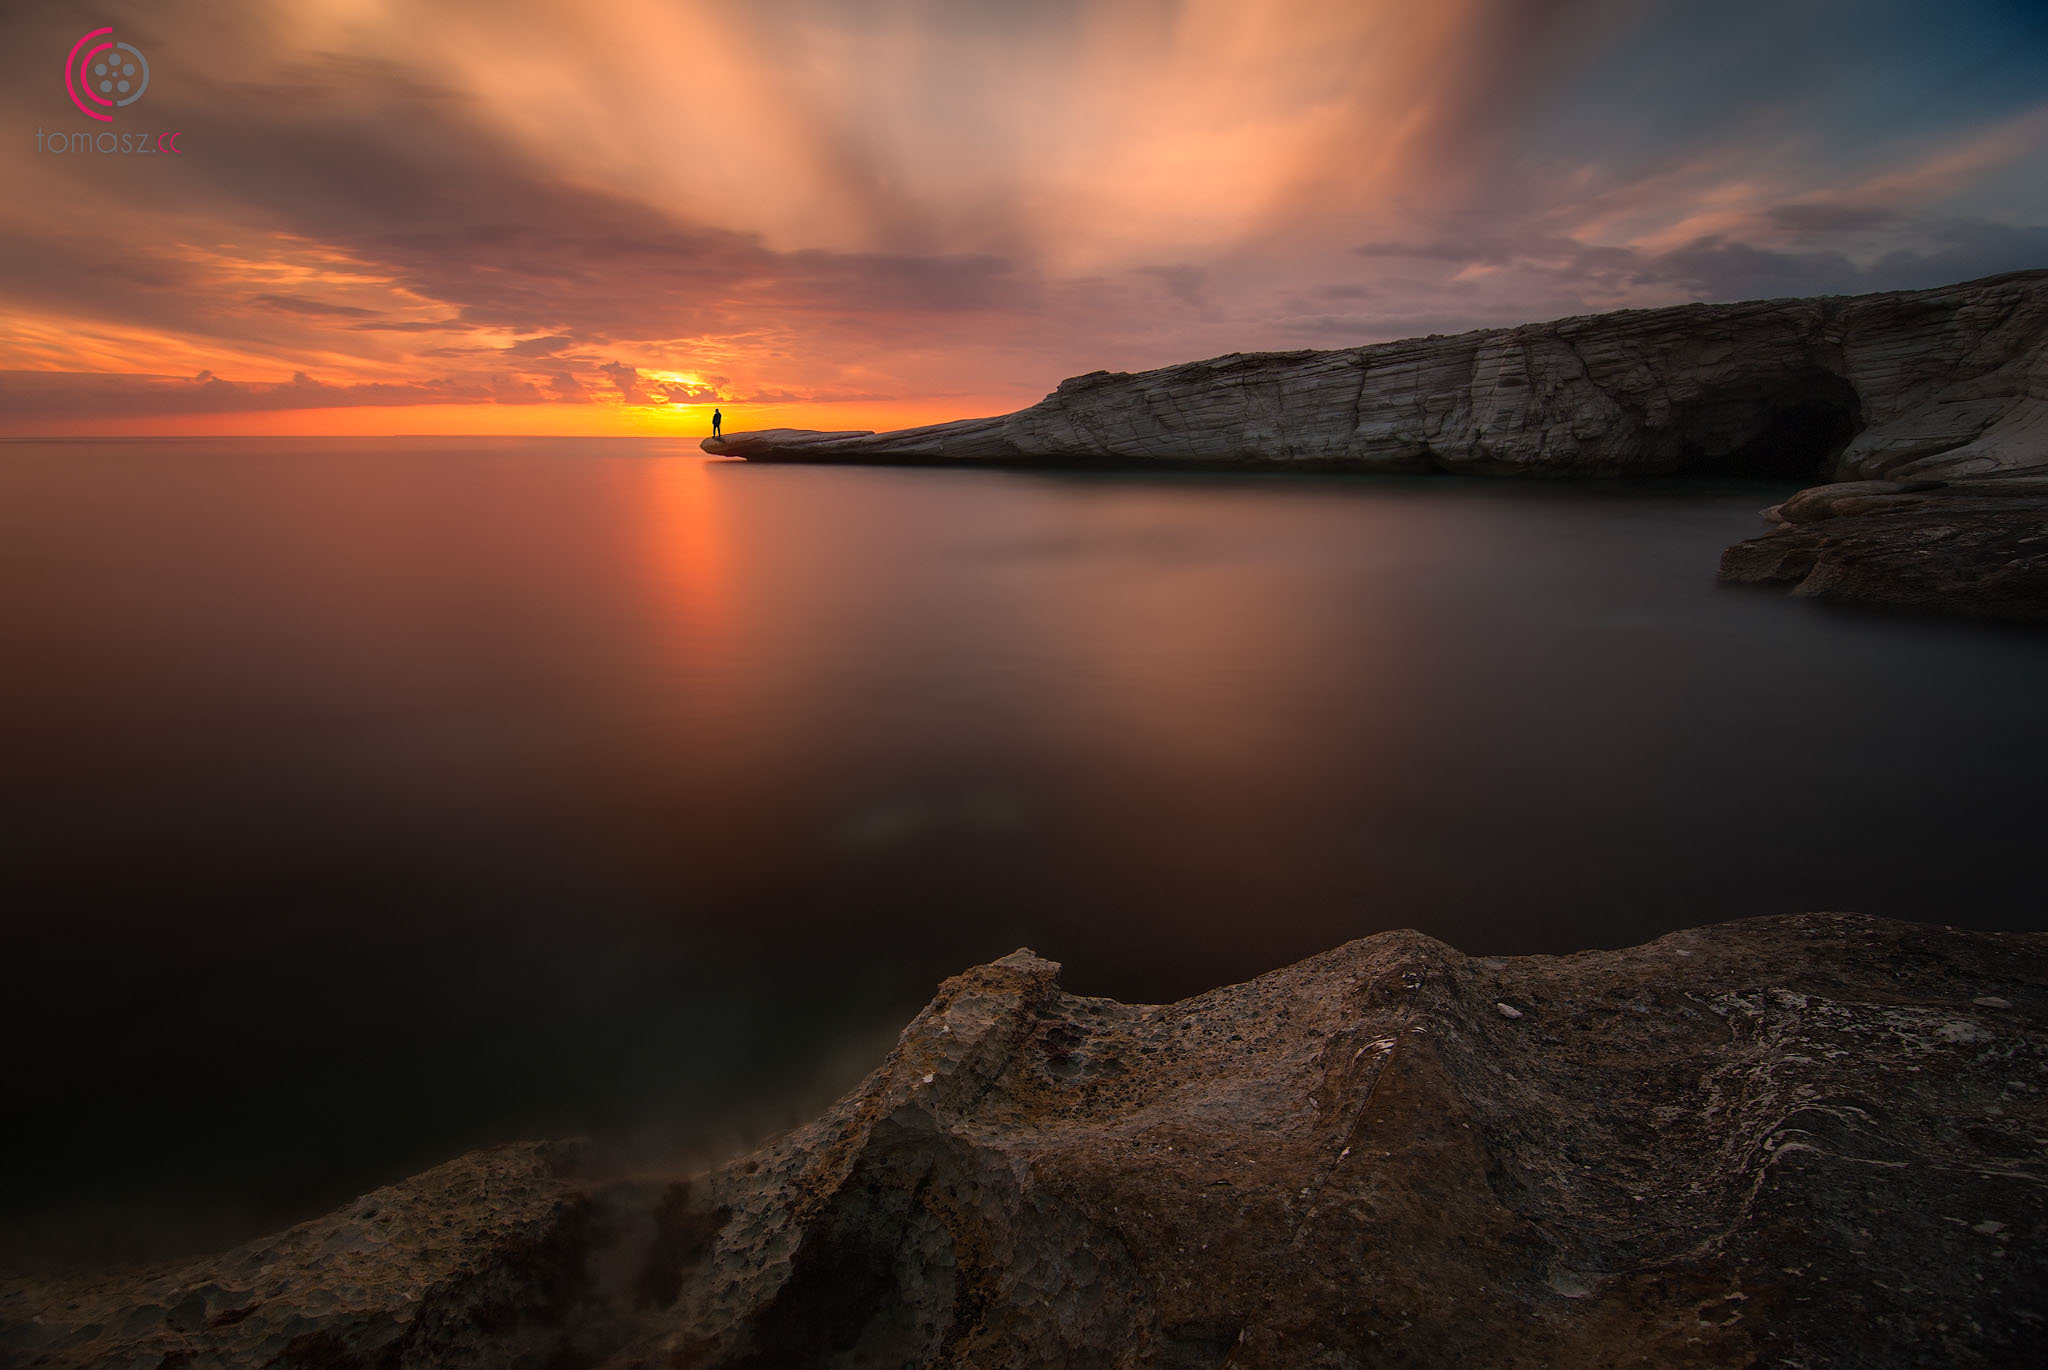 2012-11-24_alamanos_sunset_01_master 00-08-42-919